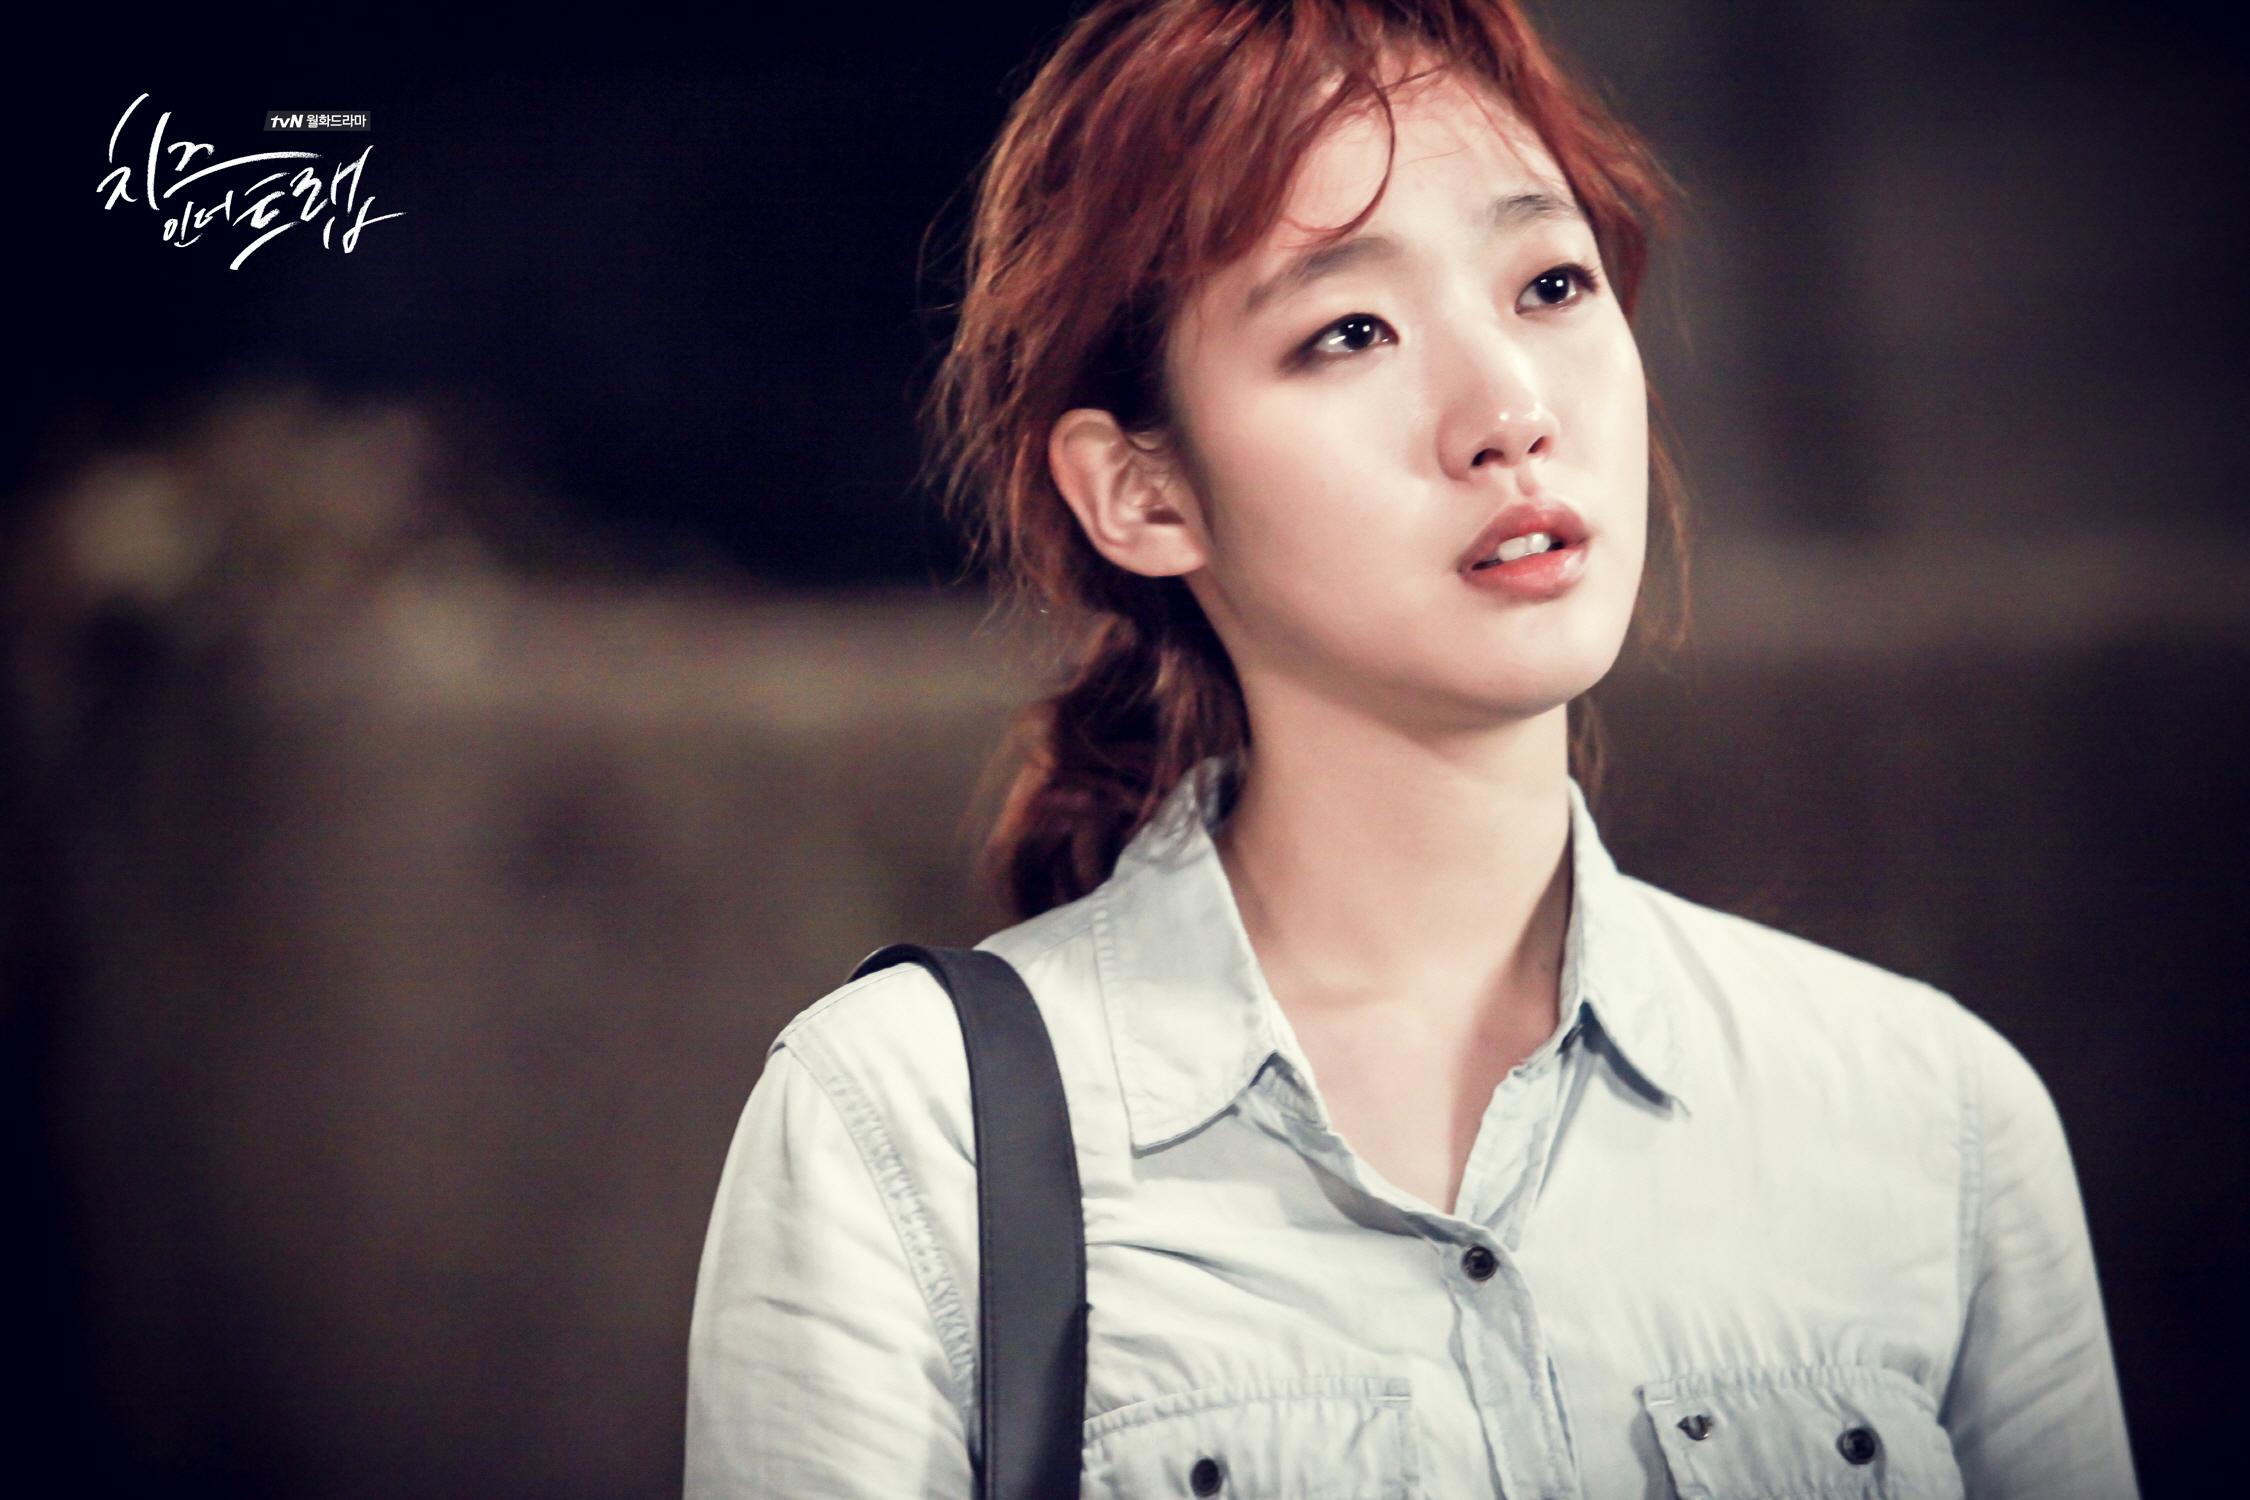 NO~都不是XD 其實只是因為韓國網友們找到了和金高恩長得很像的韓星啦!